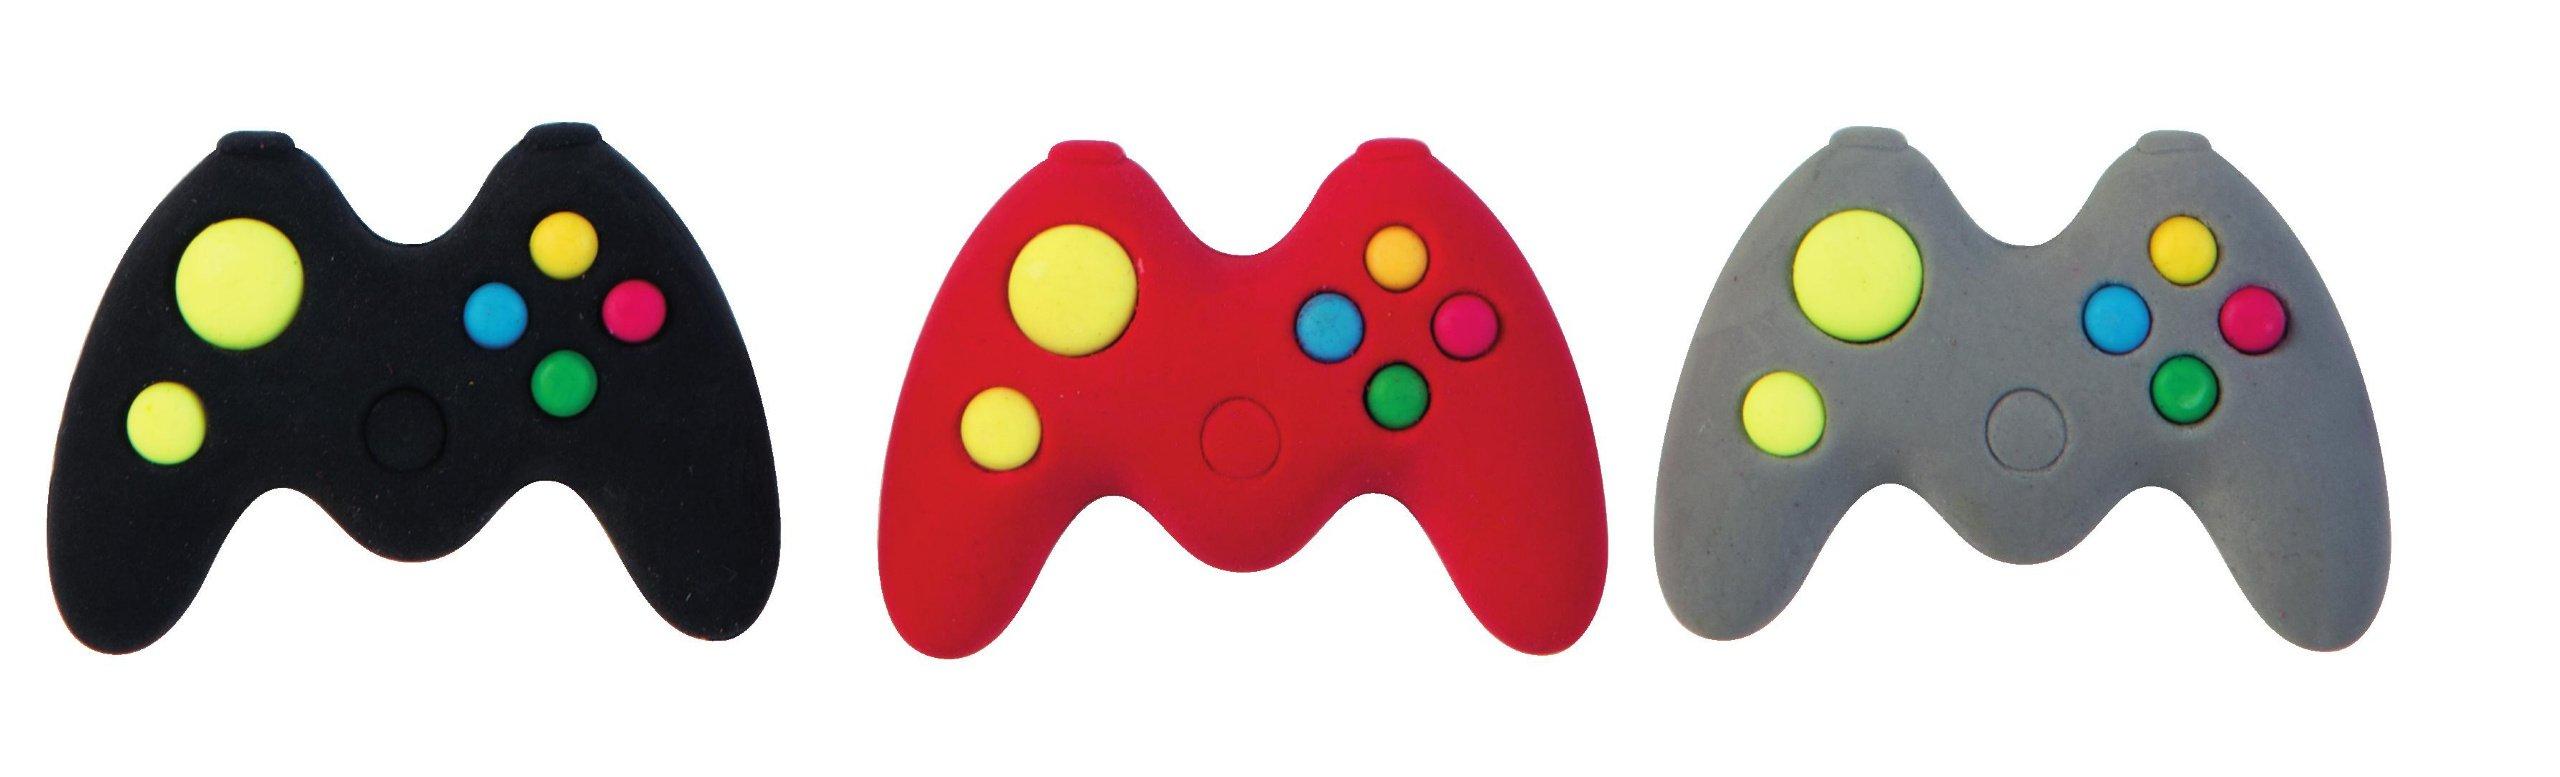 Raymond Geddes Game Controller Erasers, Set of 24 (69755)